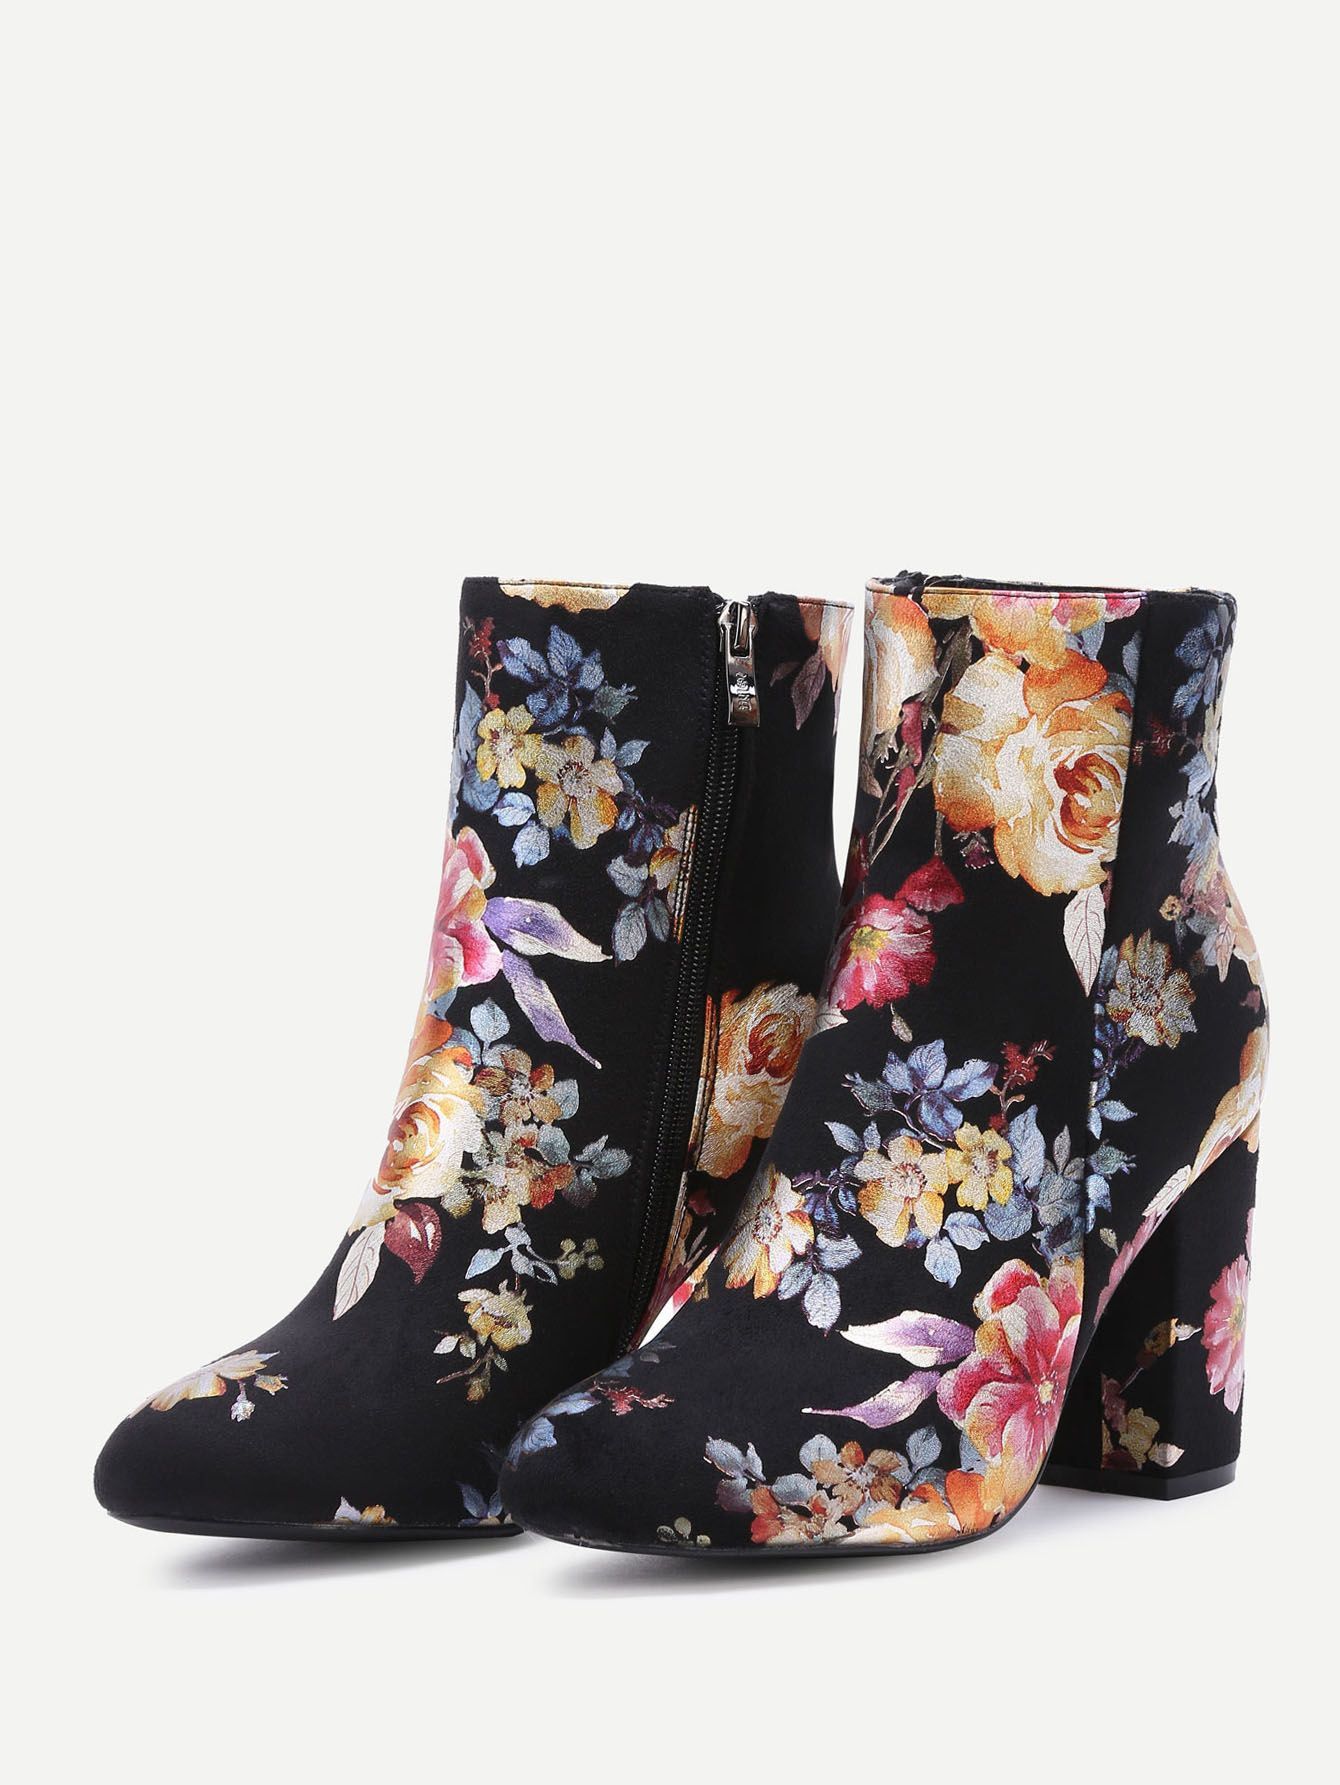 fe50a26910 Black Flower Print Suede Point Toe Chunky Boots -SheIn(Sheinside ...